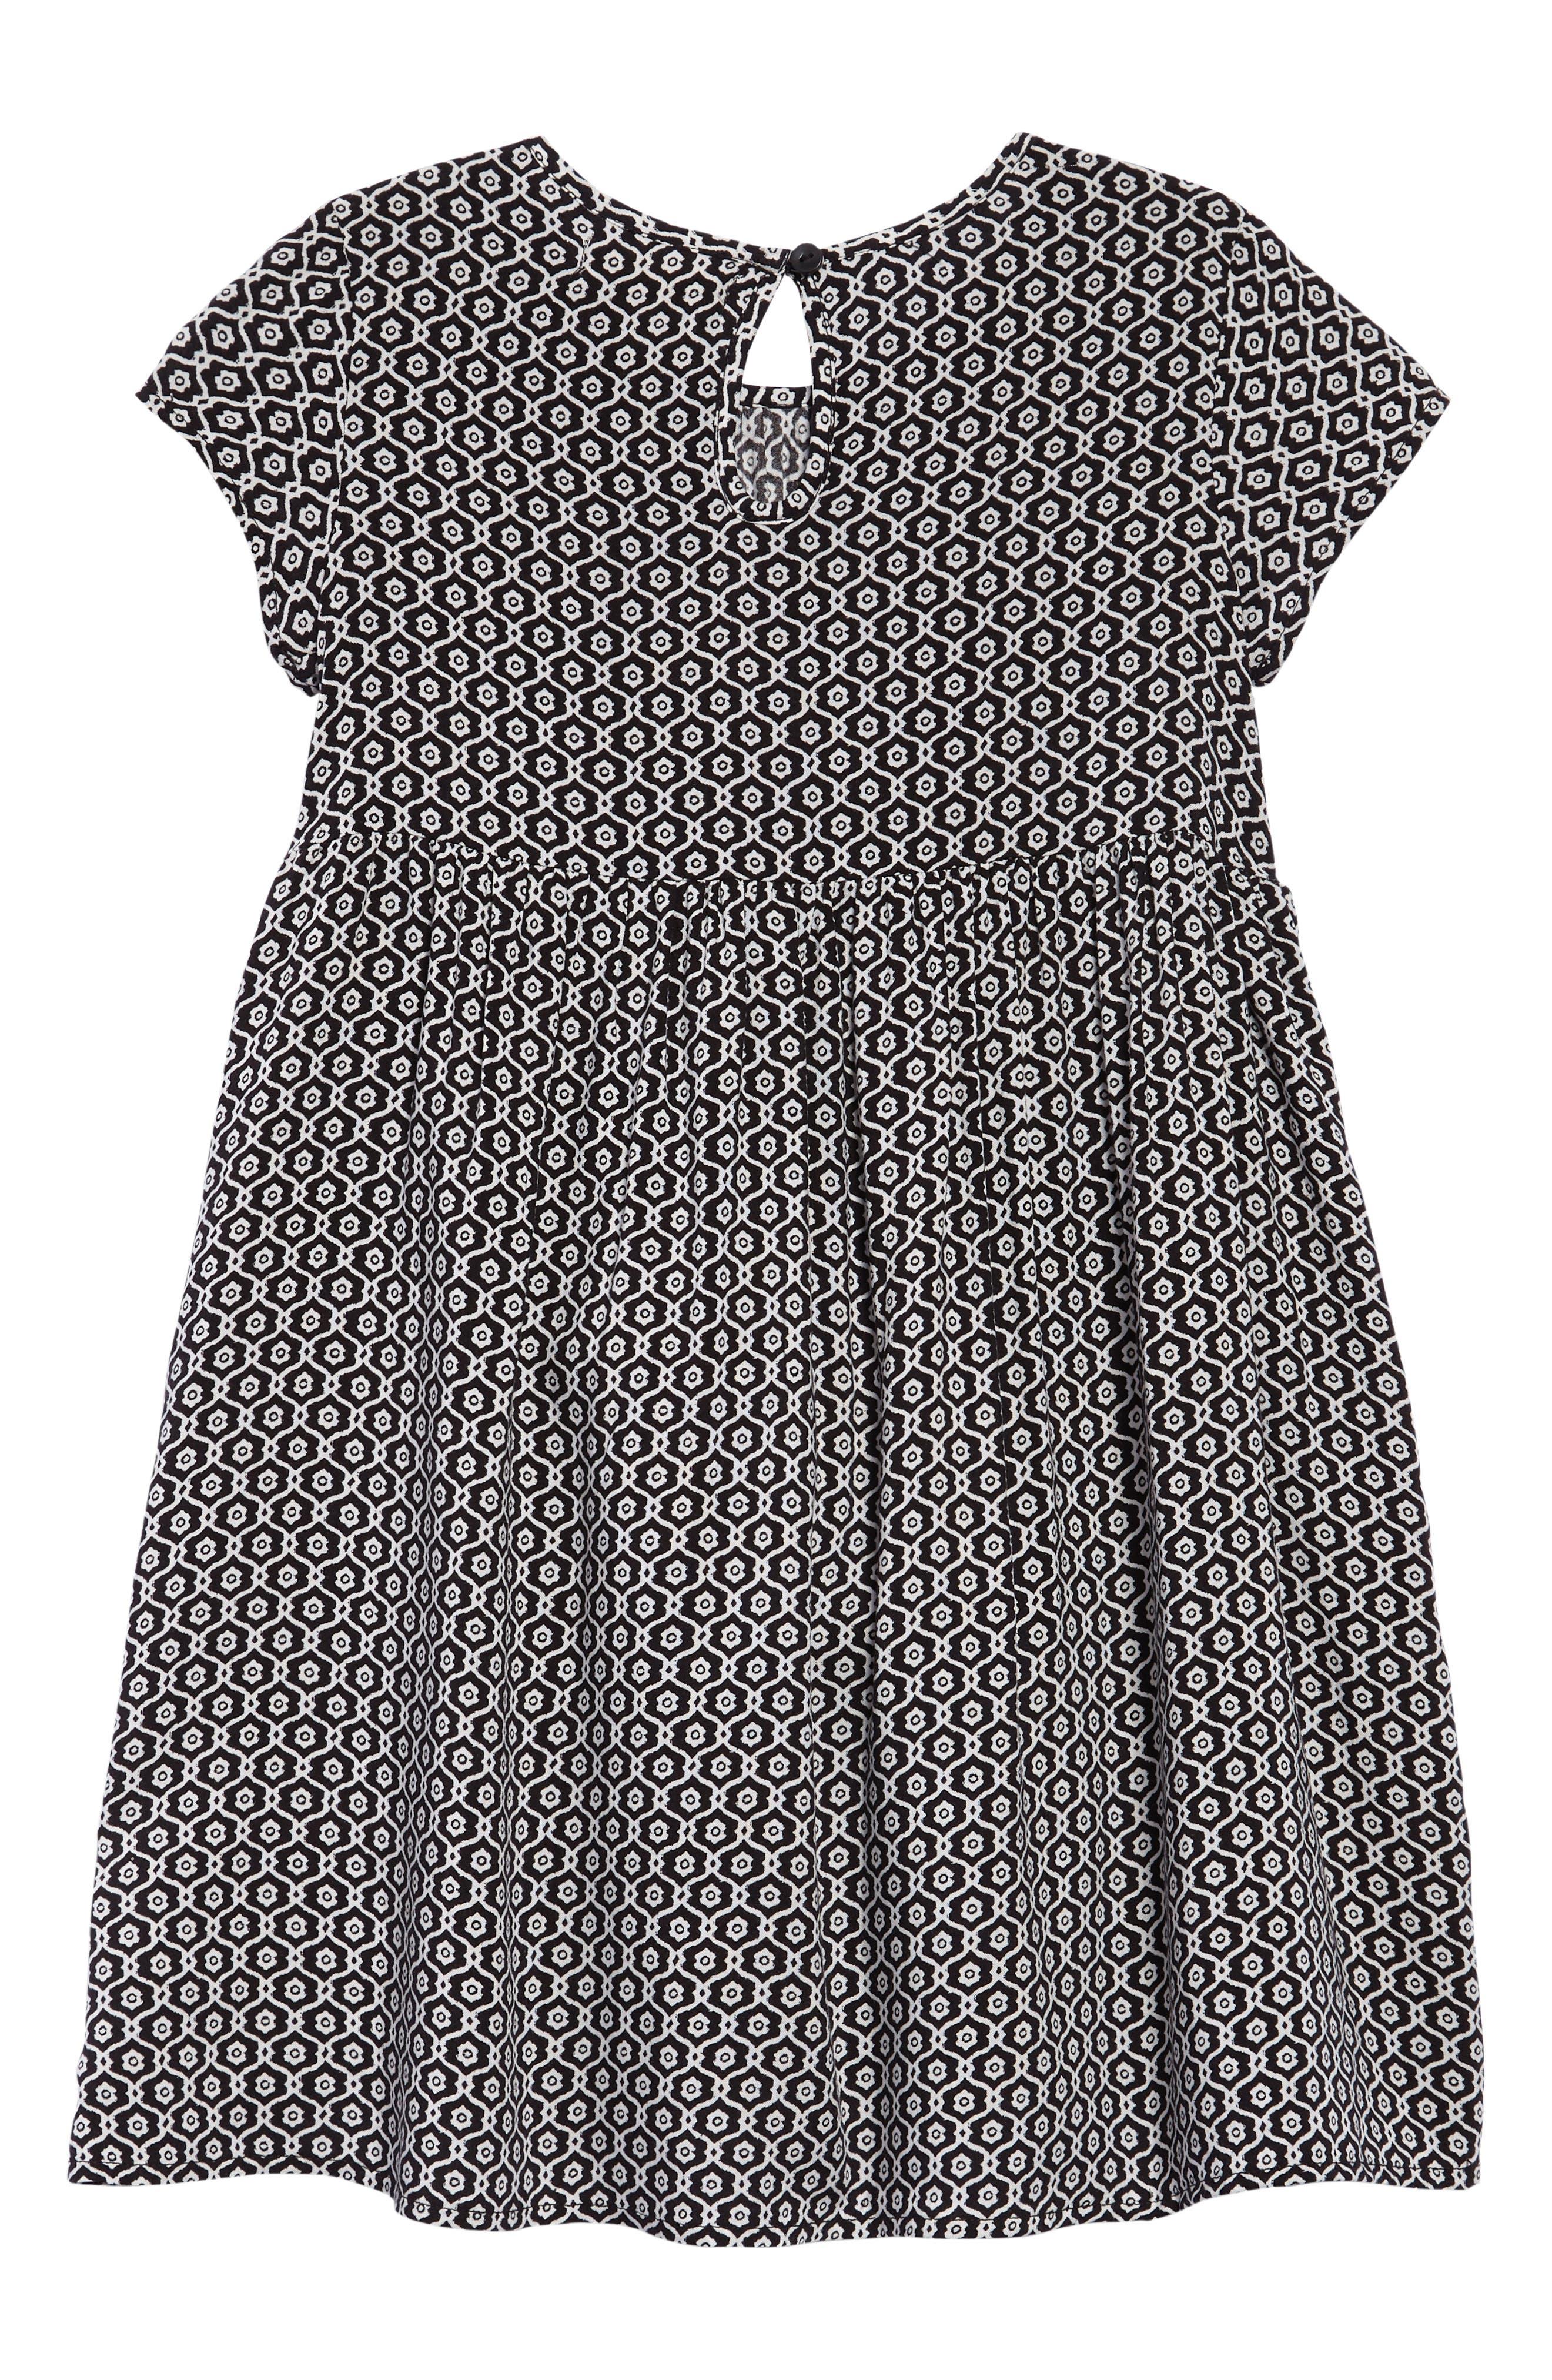 Print Dress,                             Alternate thumbnail 2, color,                             001